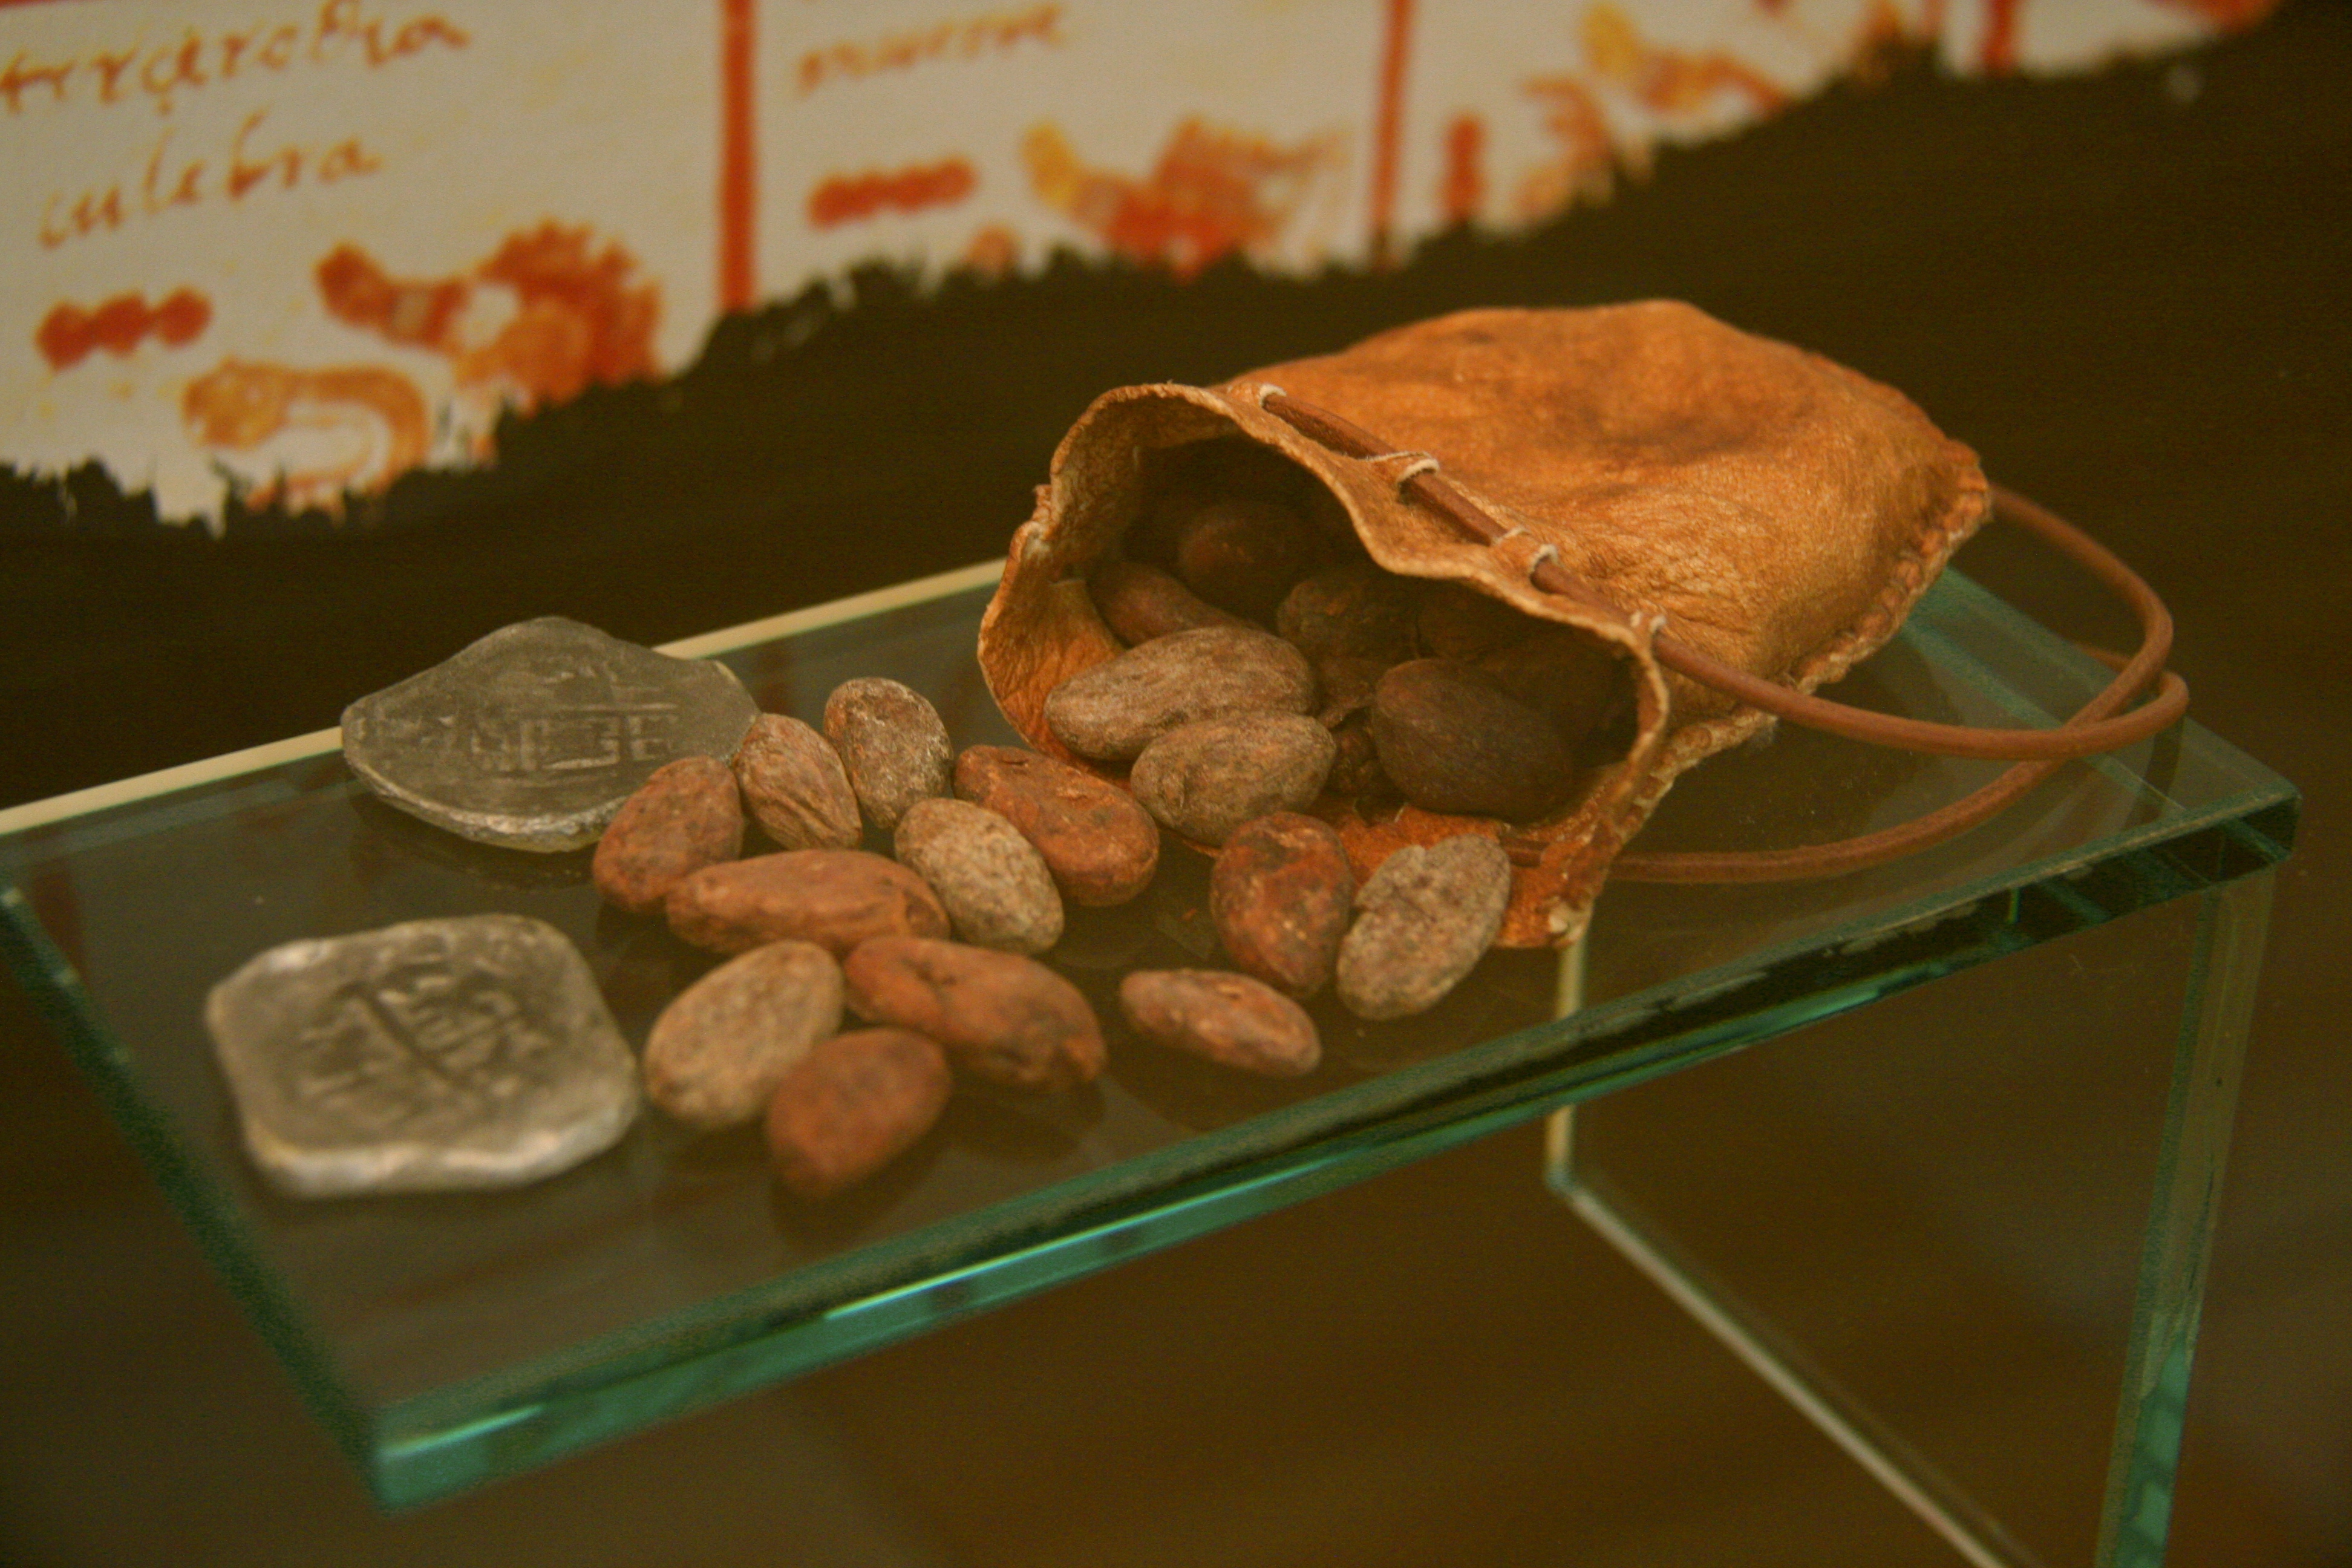 histoire de la culture du cacao wikiwand. Black Bedroom Furniture Sets. Home Design Ideas